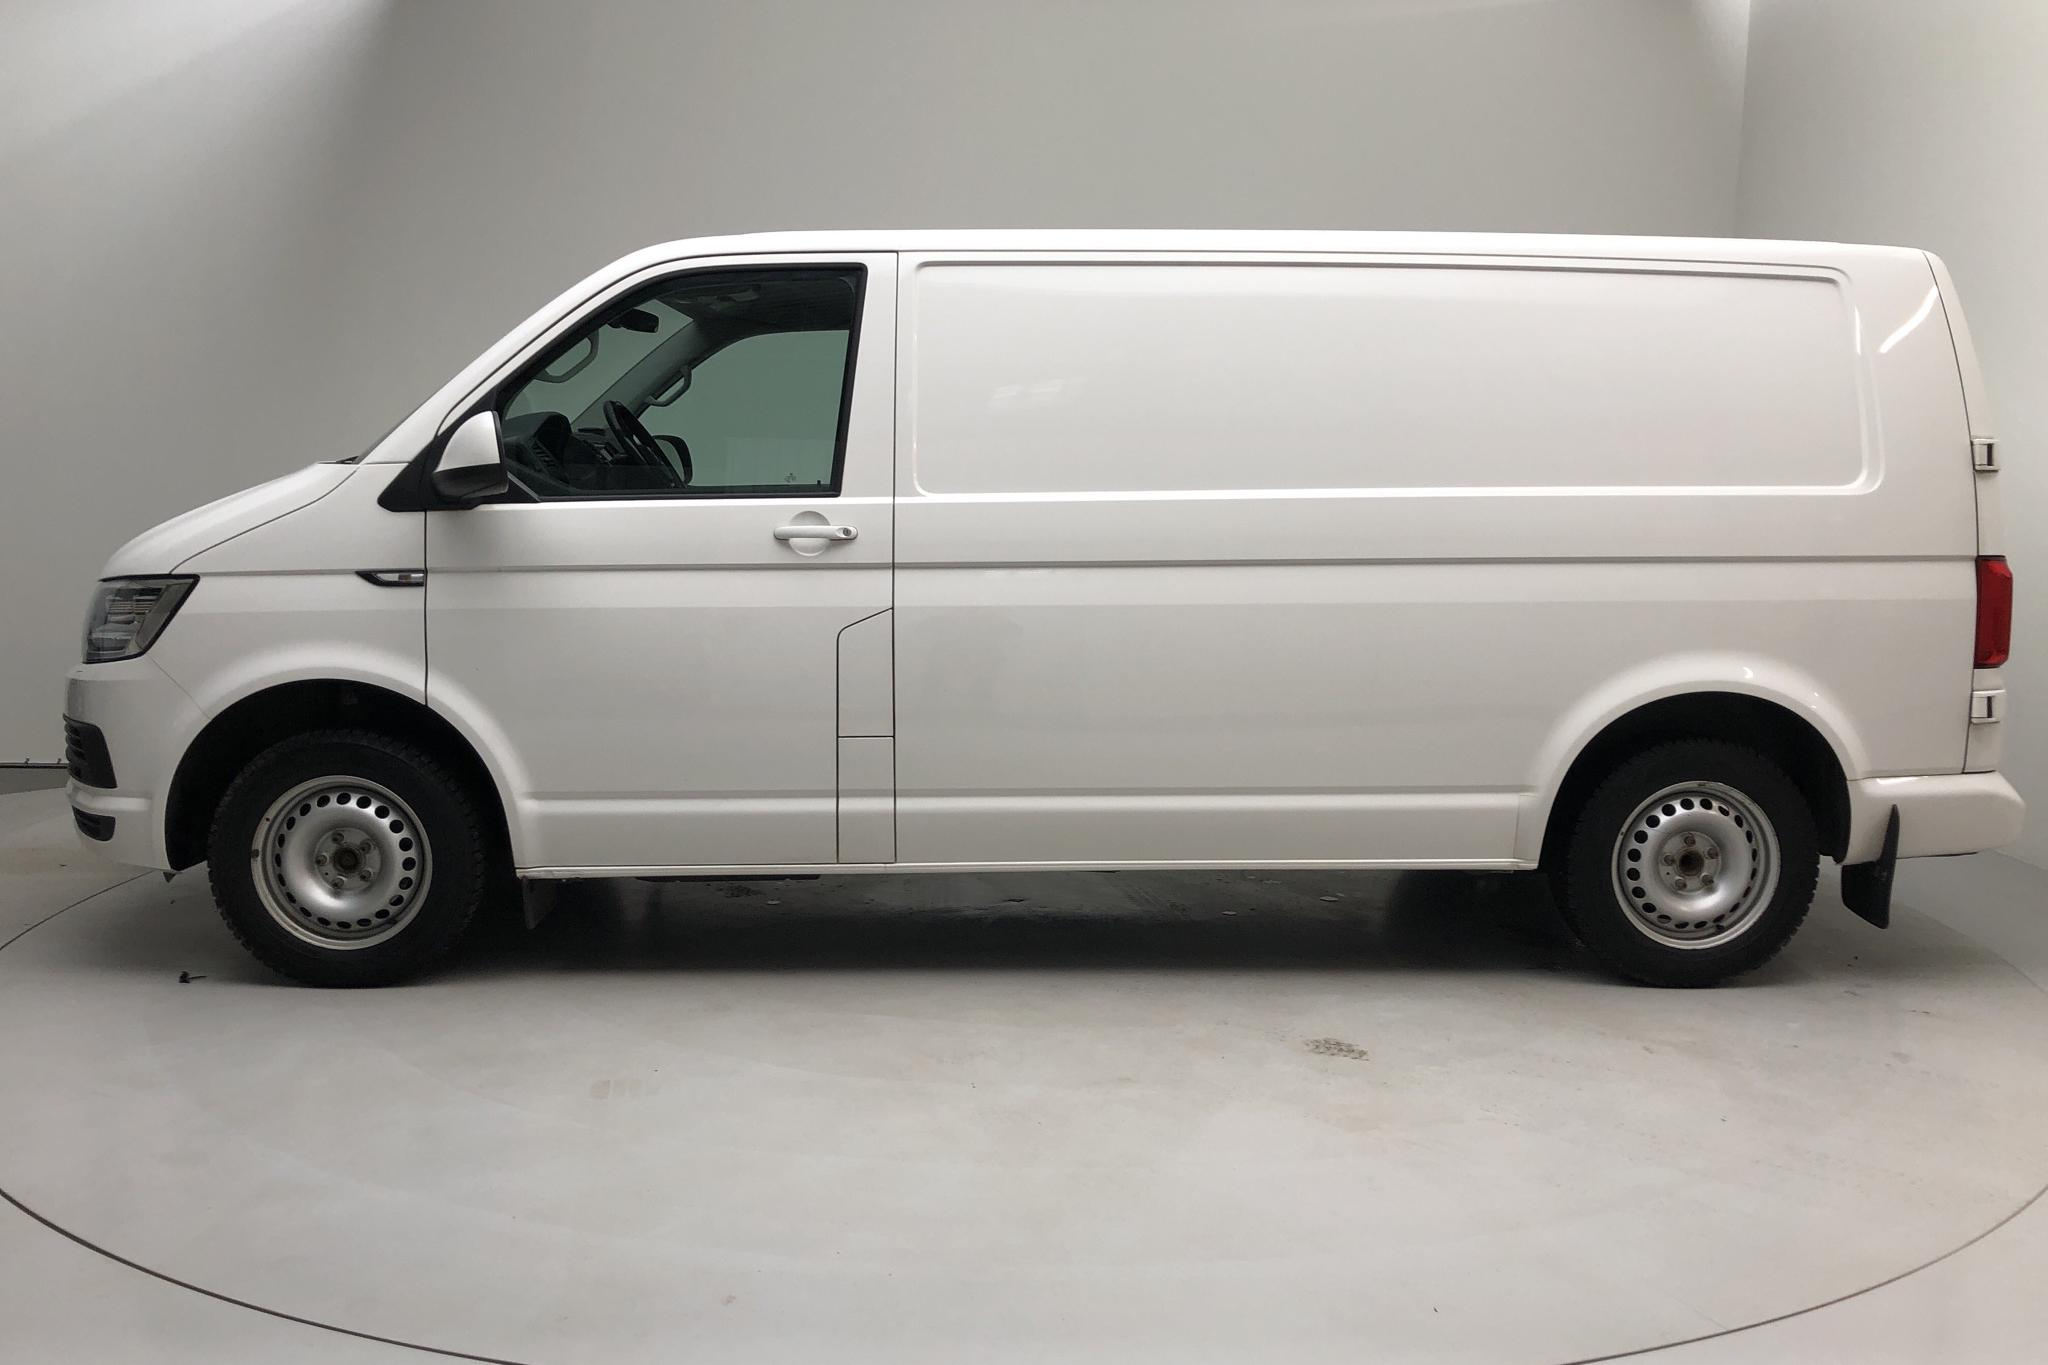 VW Transporter T6 2.0 TDI BMT Skåp (150hk) - 84 350 km - Automatic - white - 2017